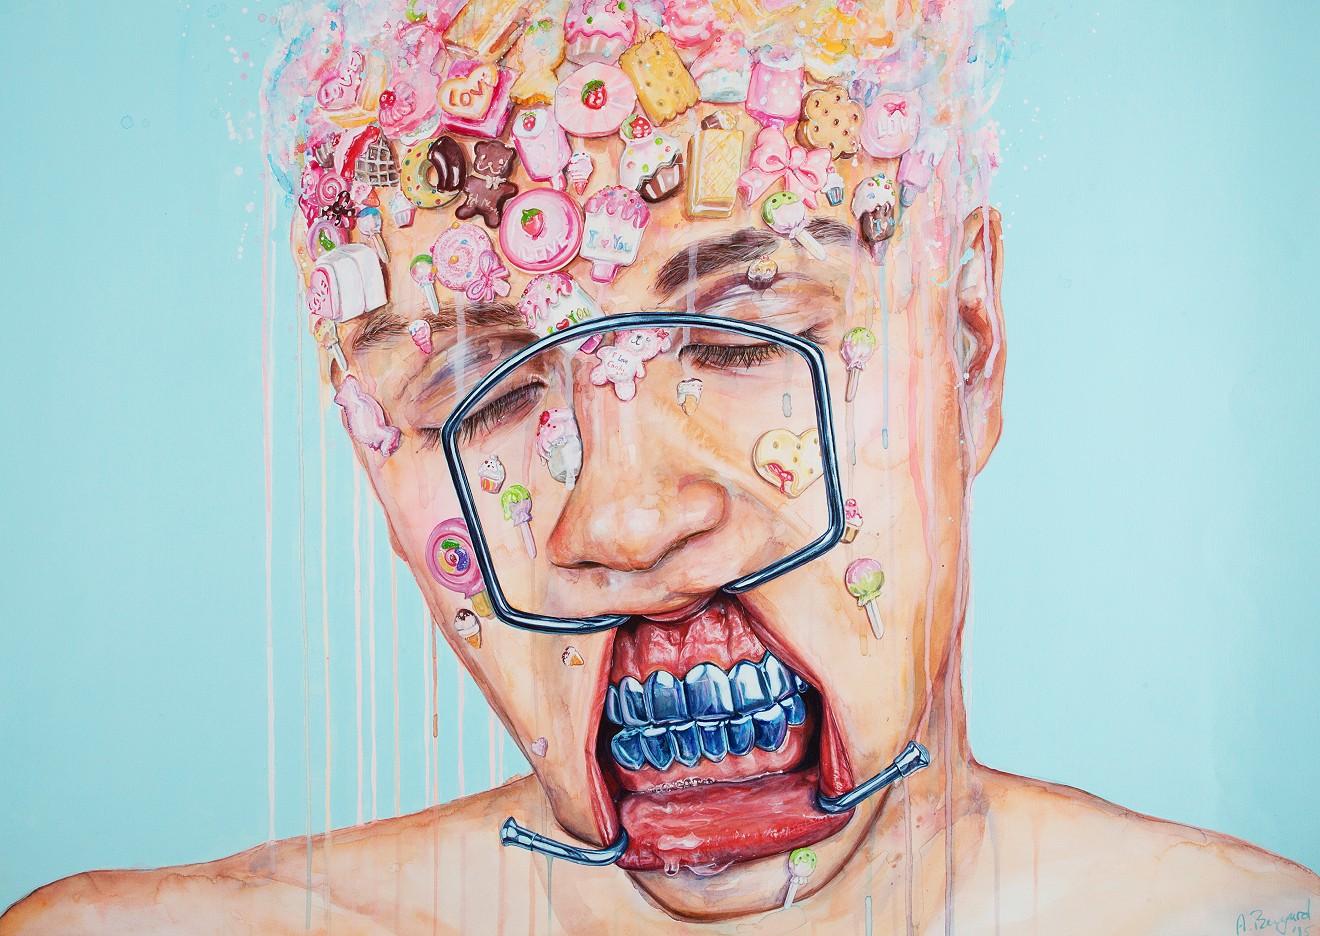 Toothache (feat. Candy Ken)